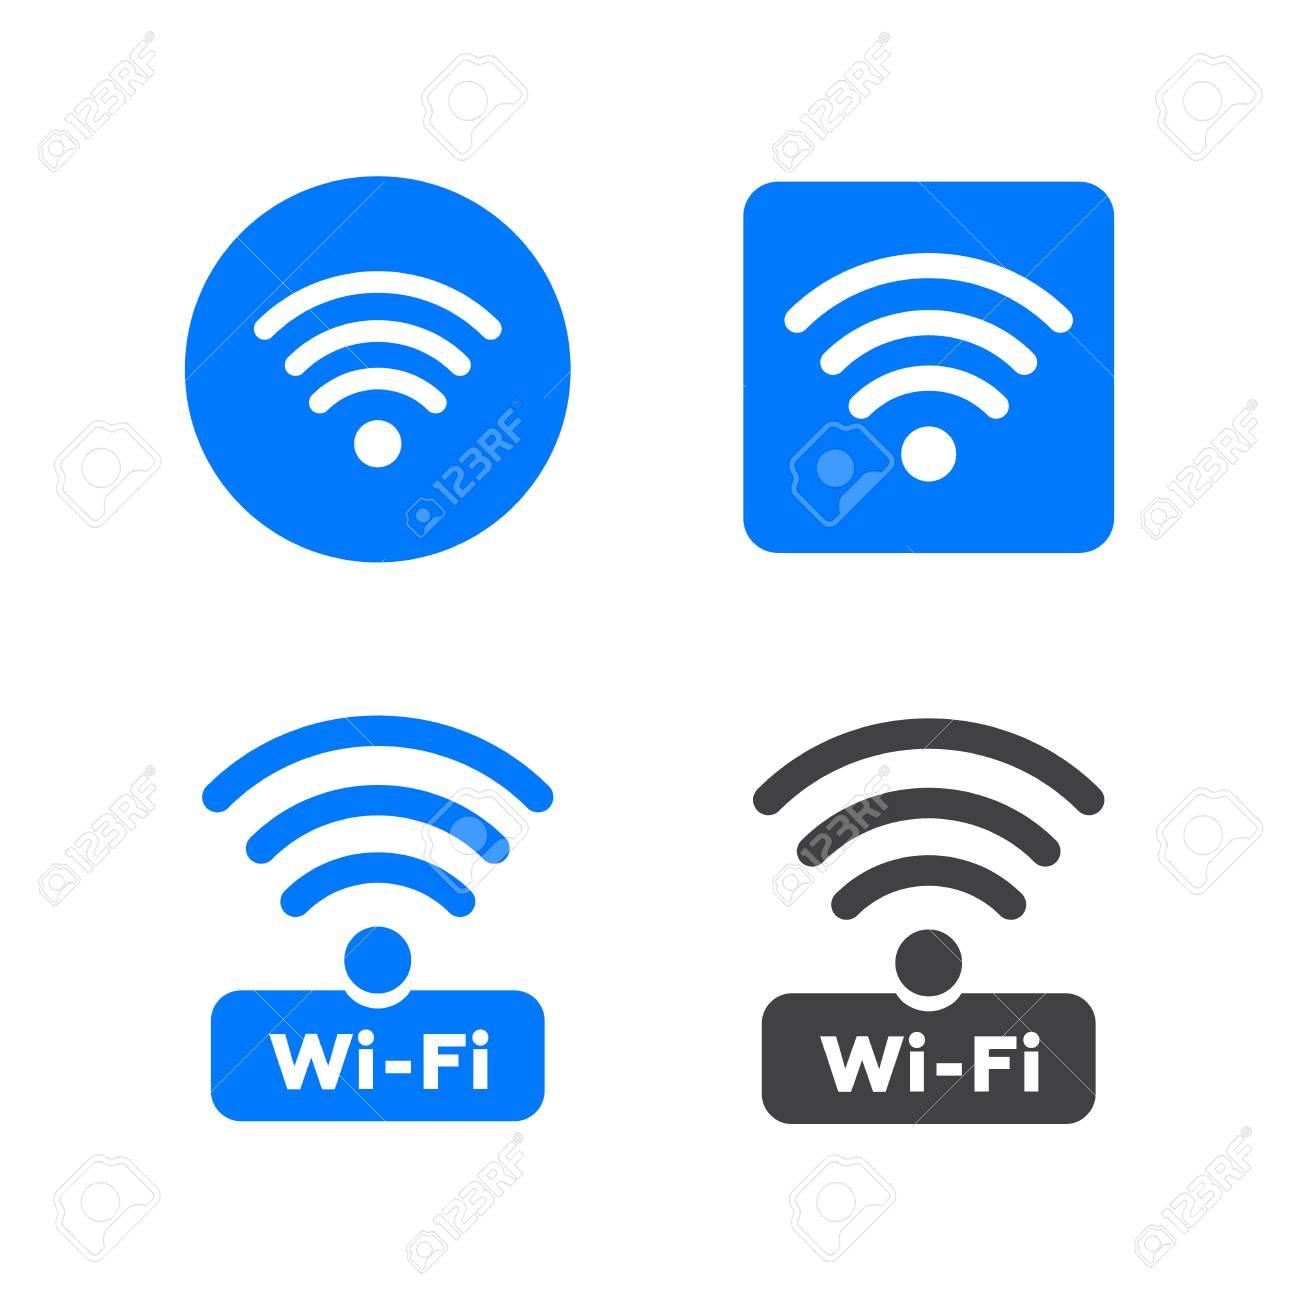 Wireless And Wireless Network Icons Wireless Network Symbol